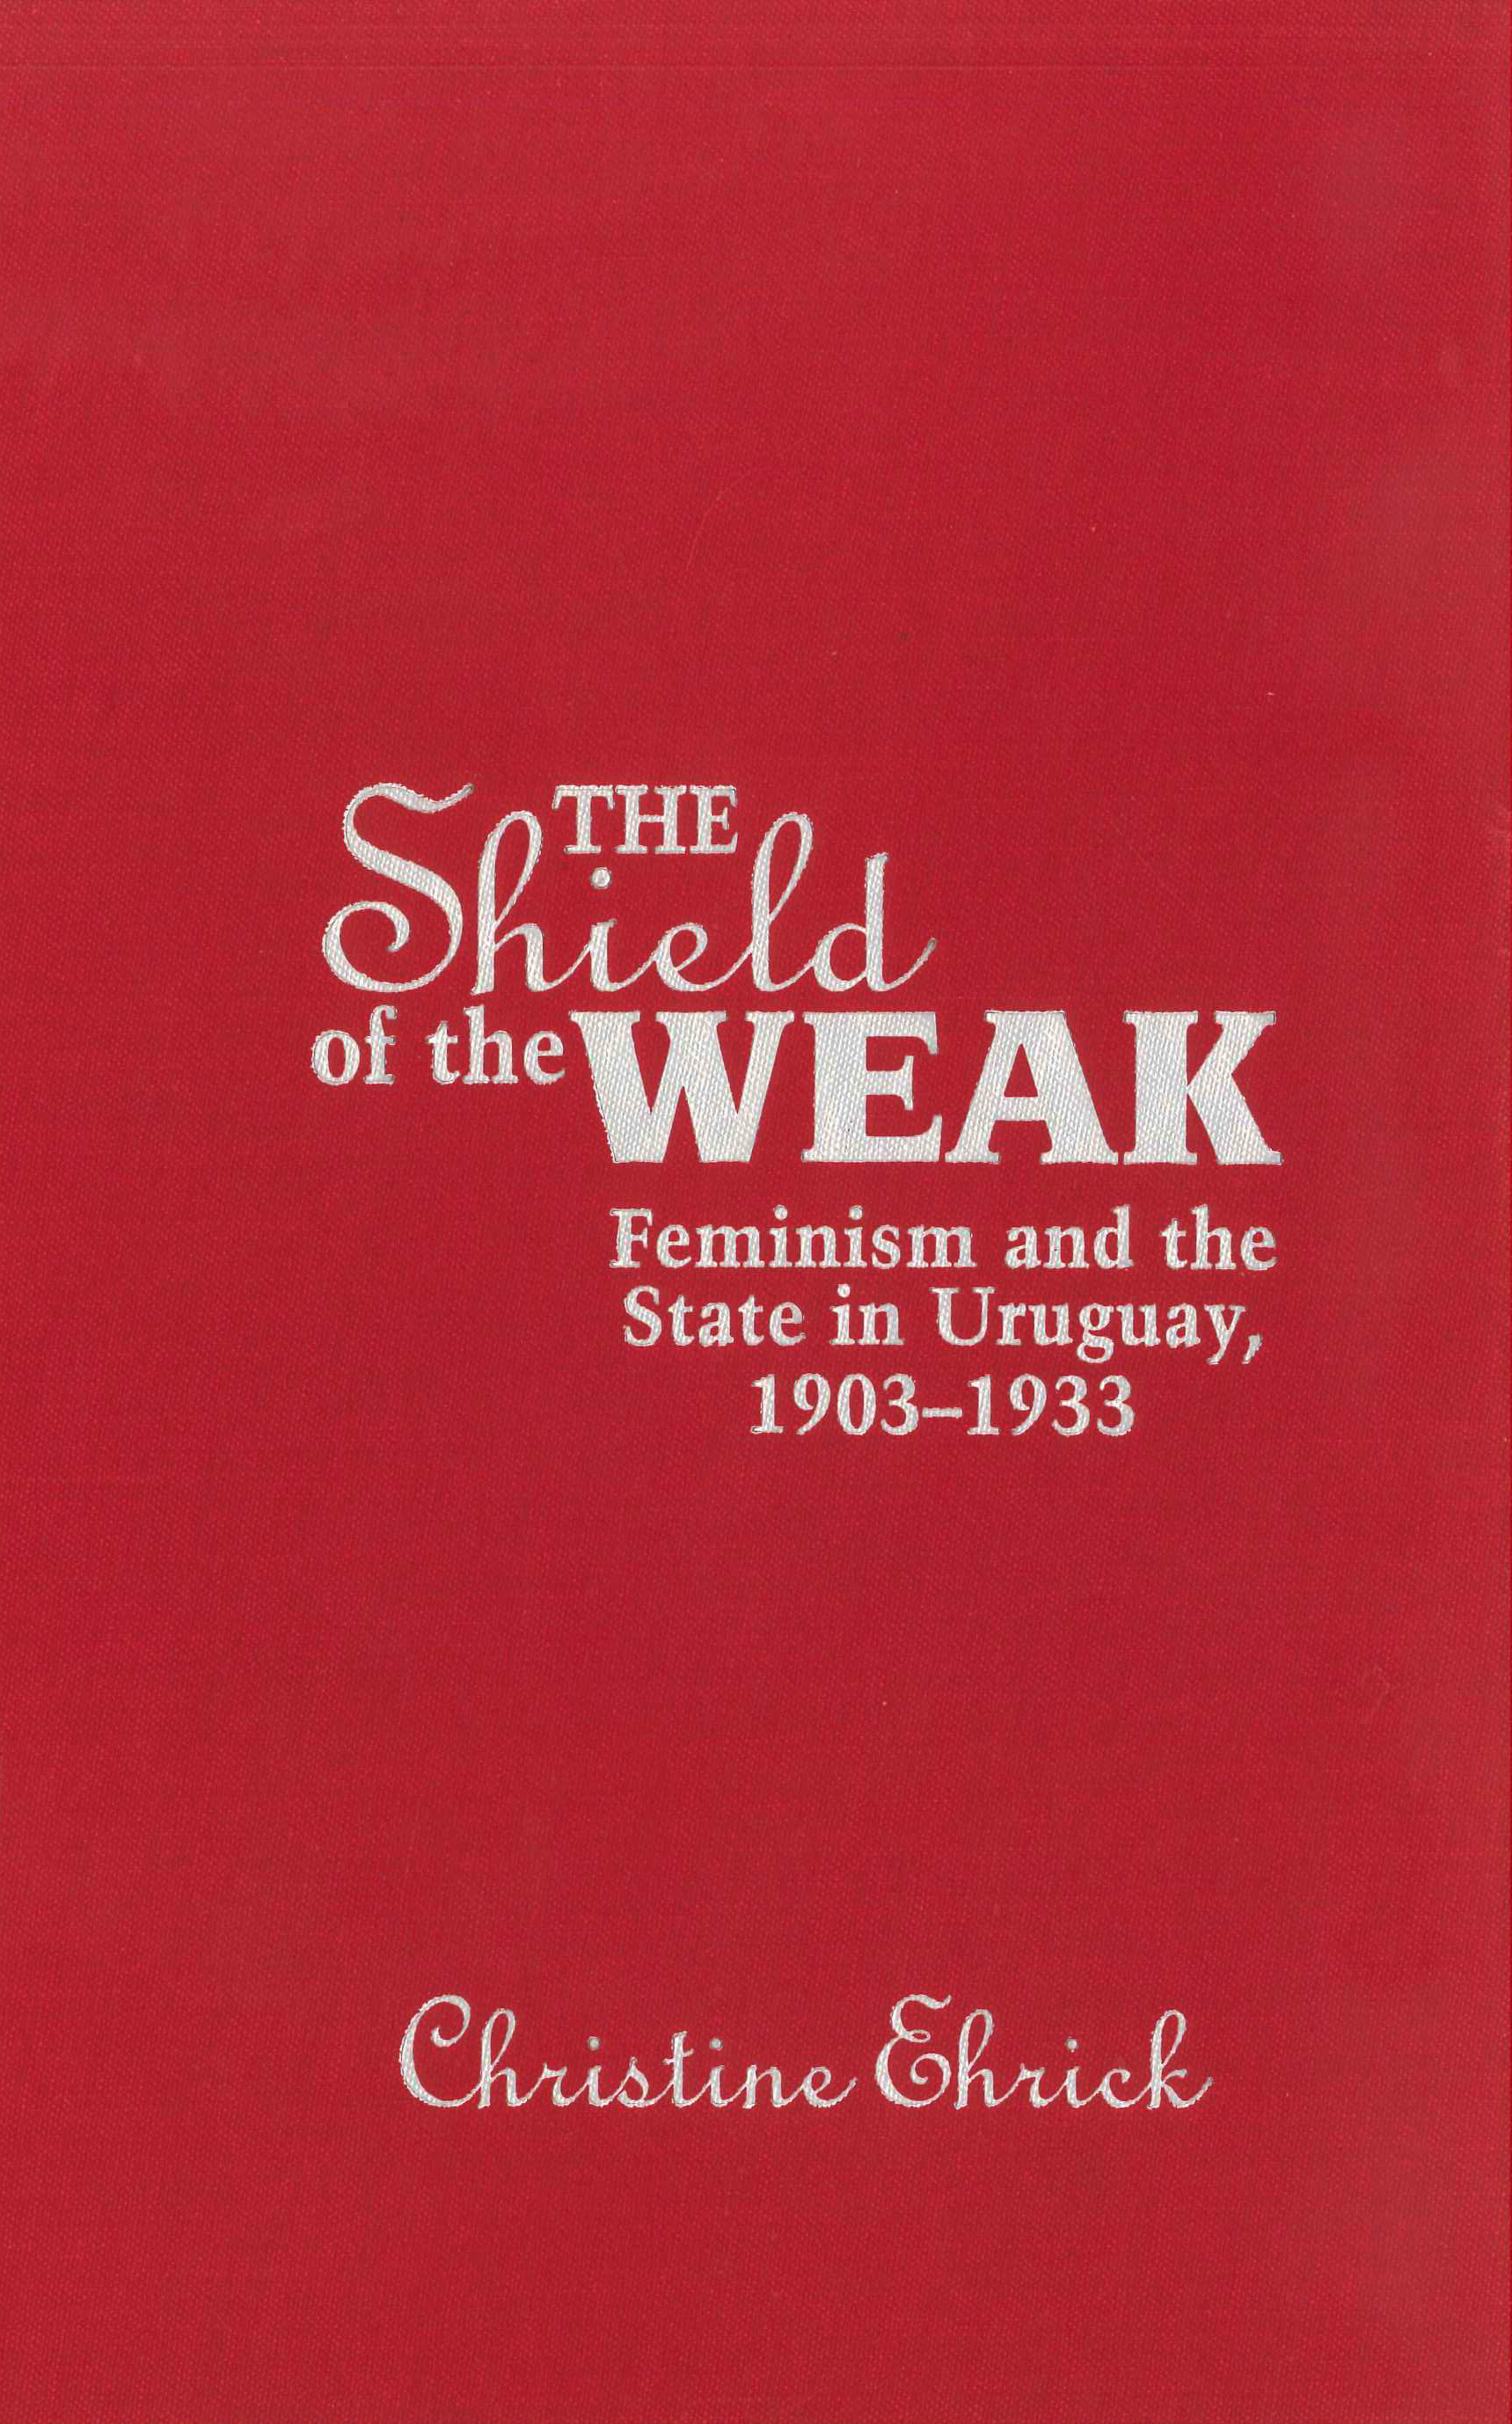 ehrick_shield of the weak